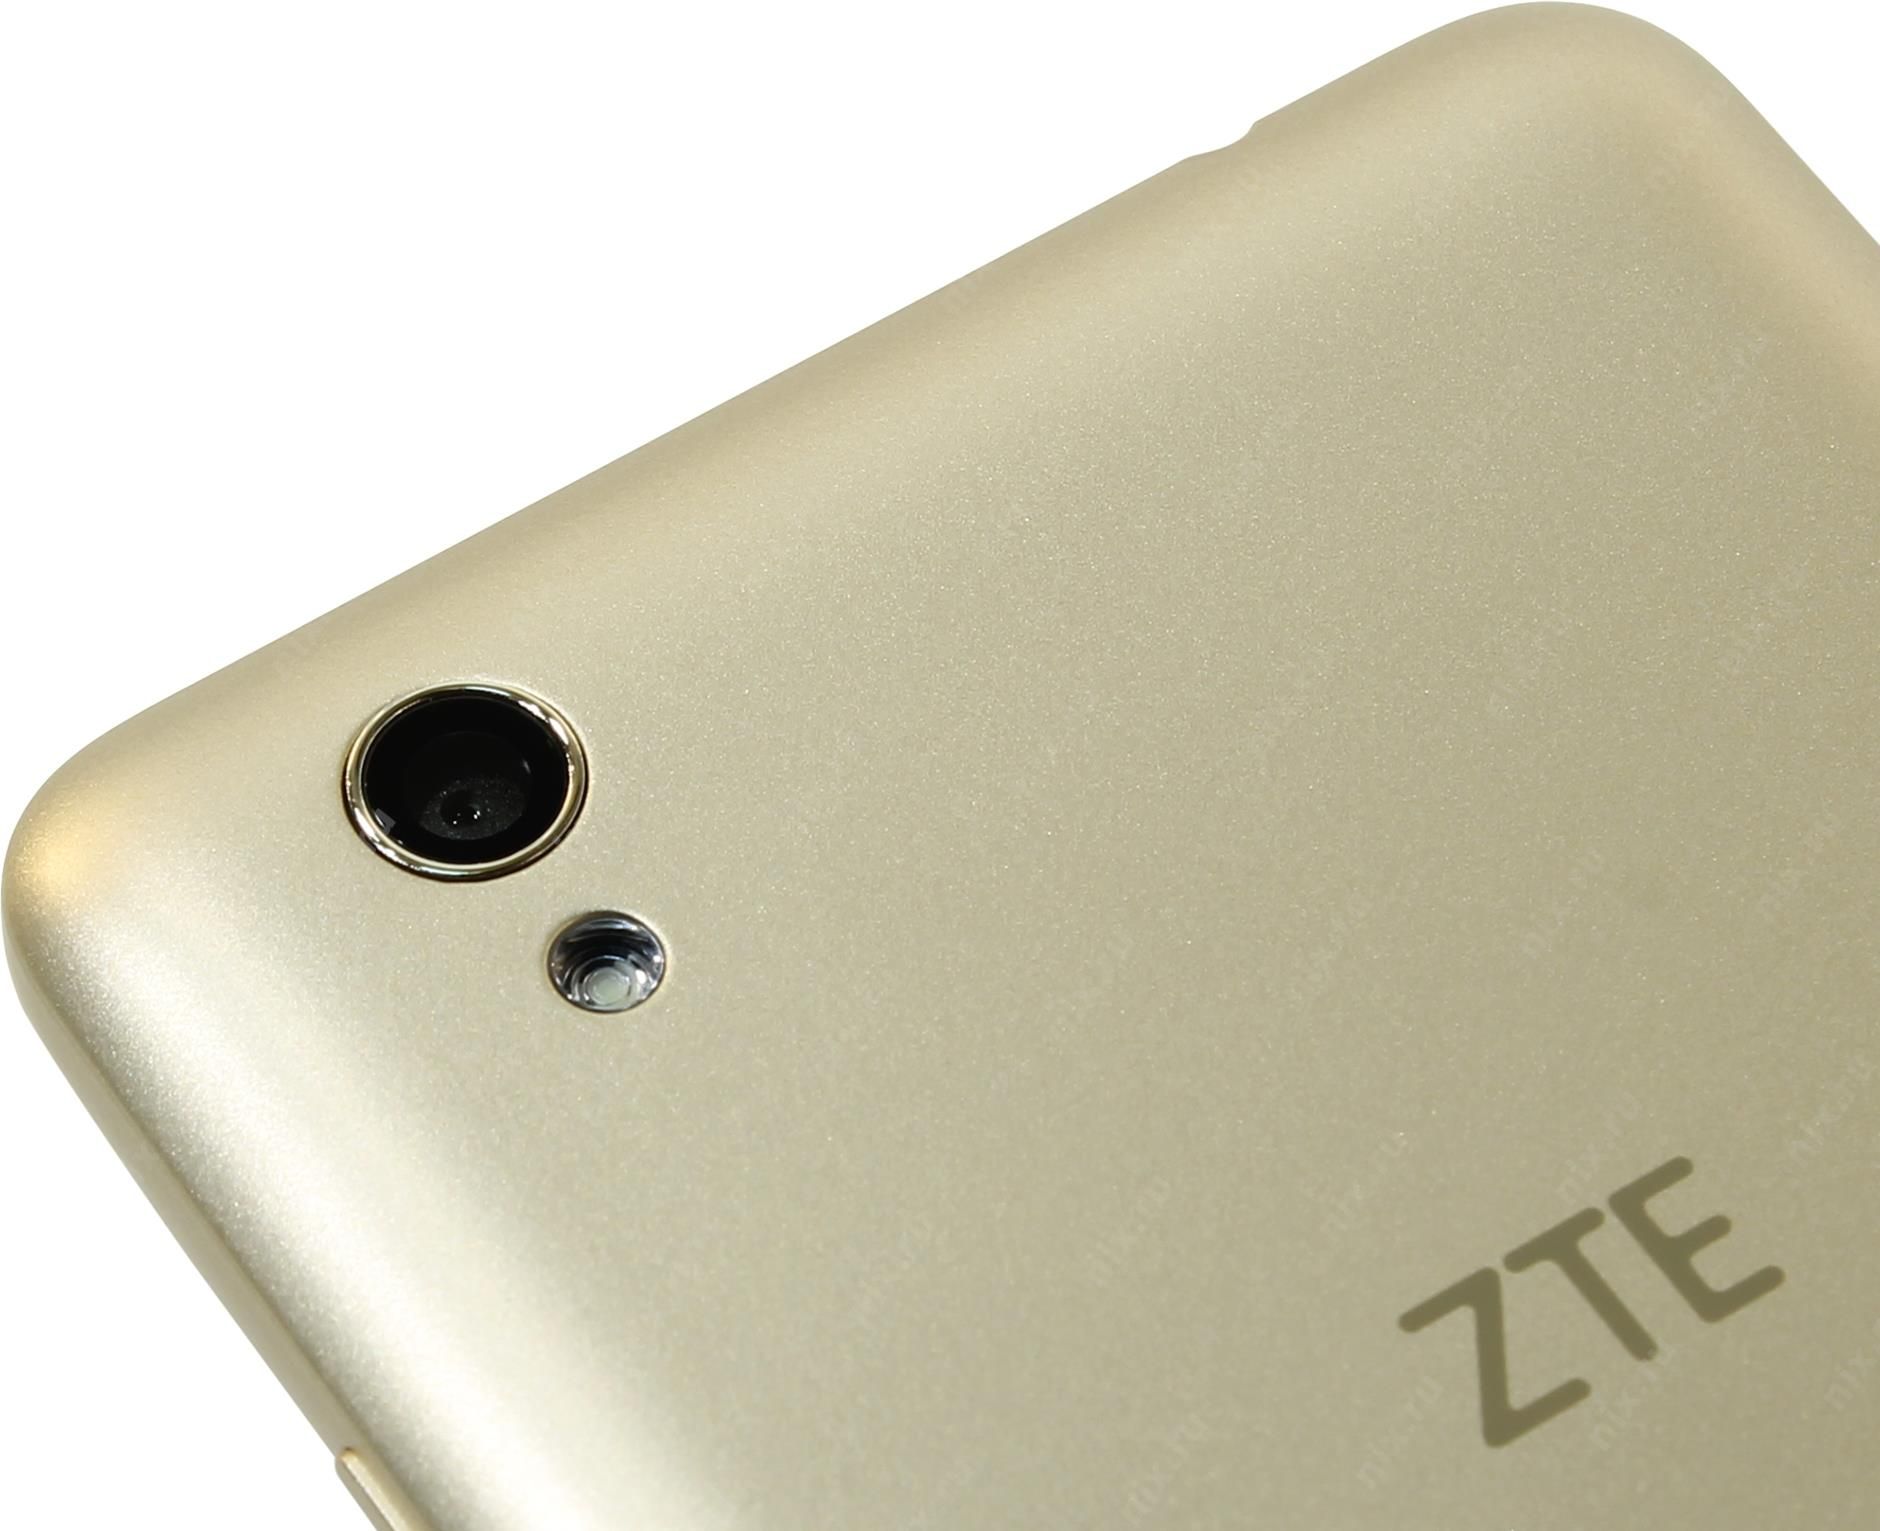 luchshie-smartfony-na-android-zte-blade-x3-kamera